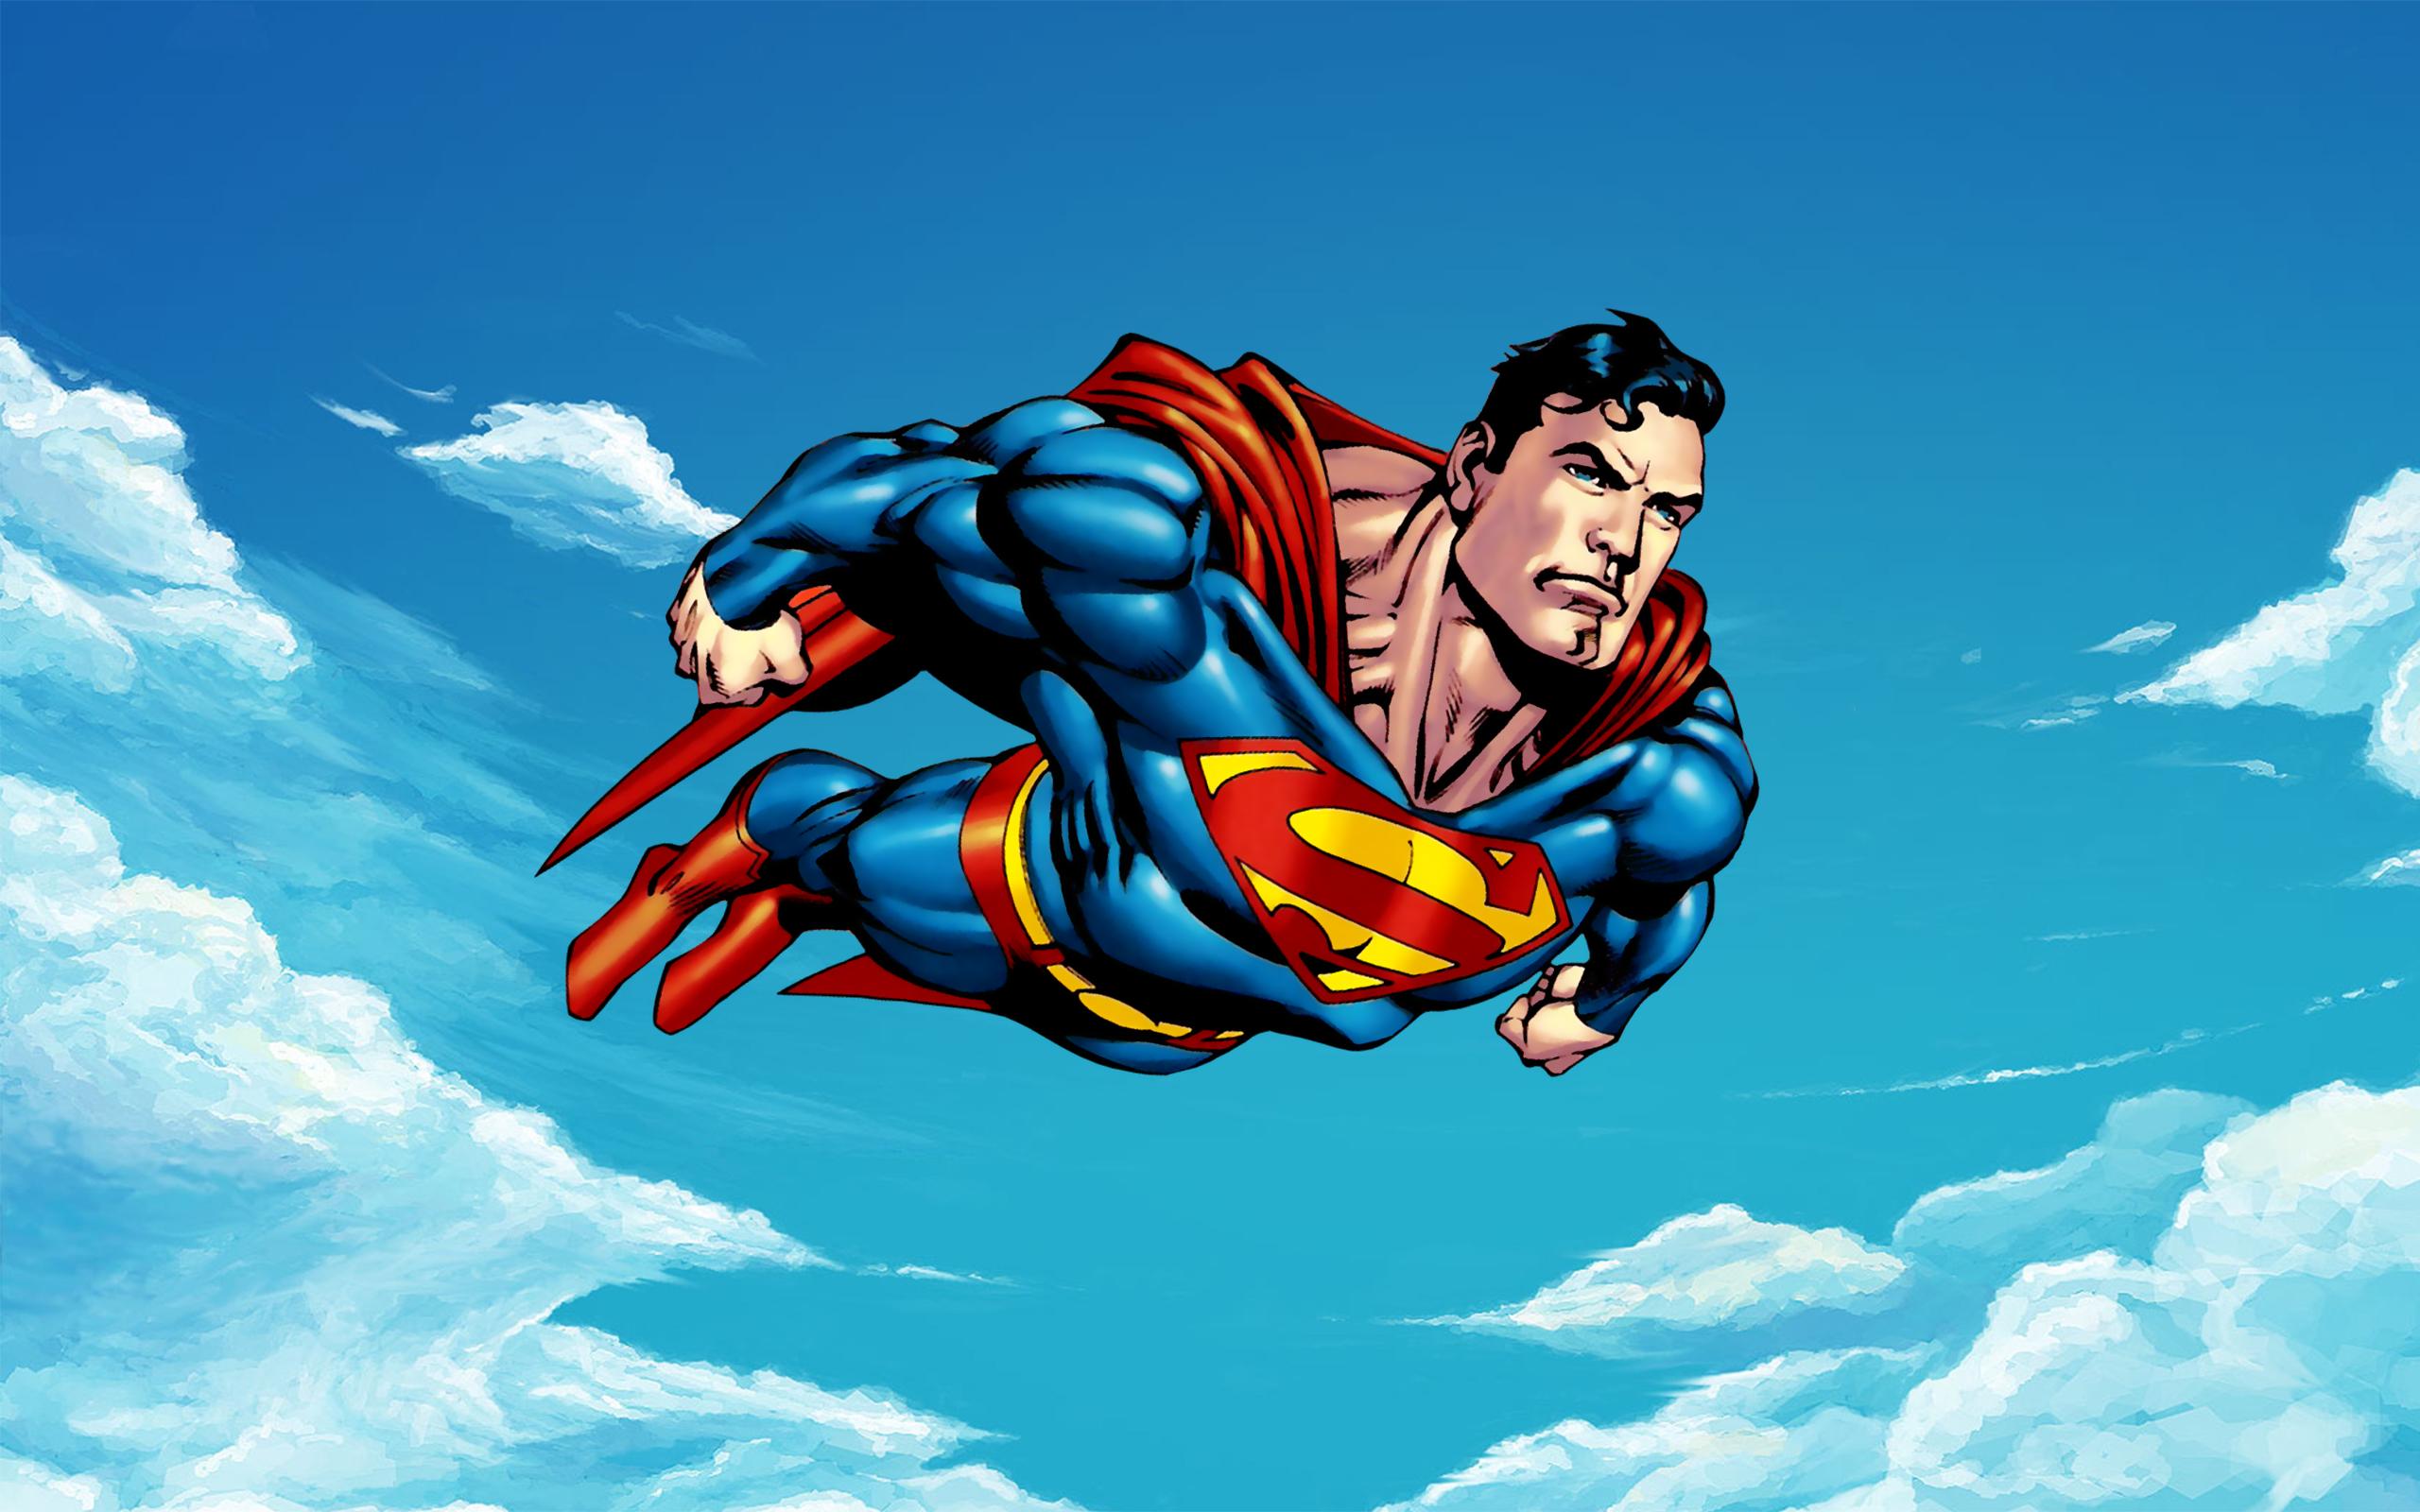 Superman full hd wallpaper and background image 2560x1600 id491487 comics superman wallpaper publicscrutiny Gallery